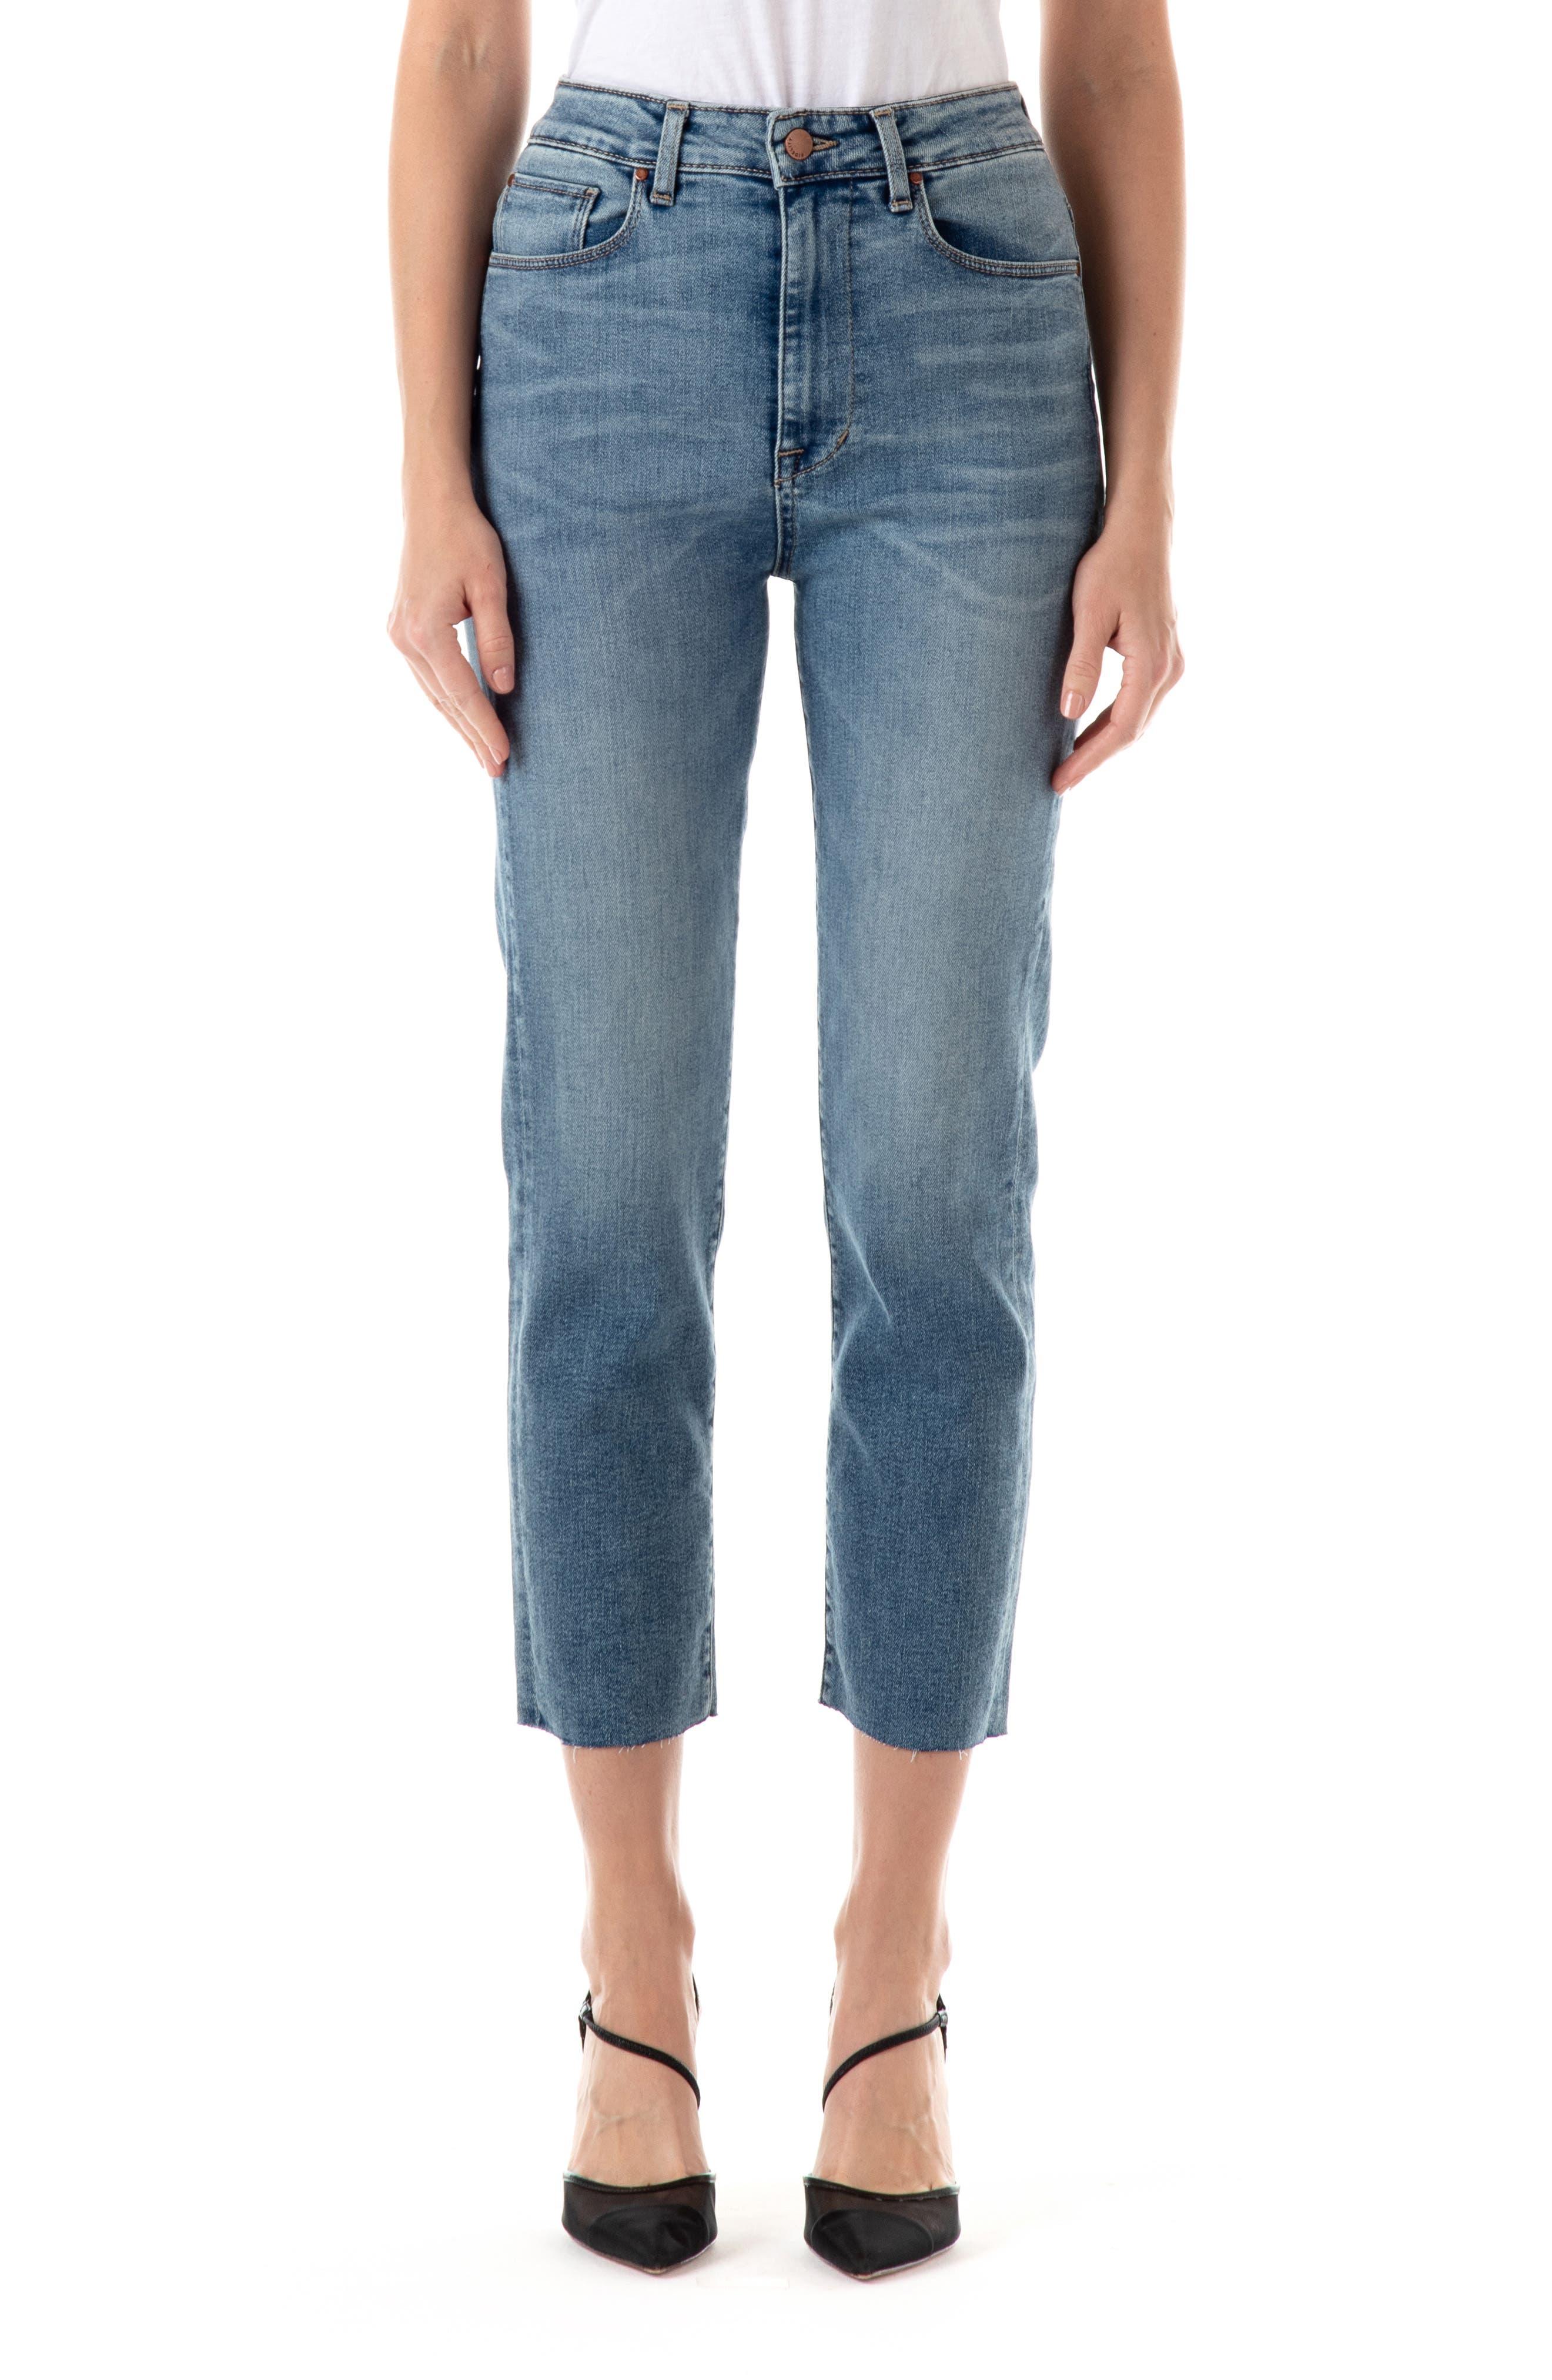 Cher High Waist Ankle Slim Straight Jeans